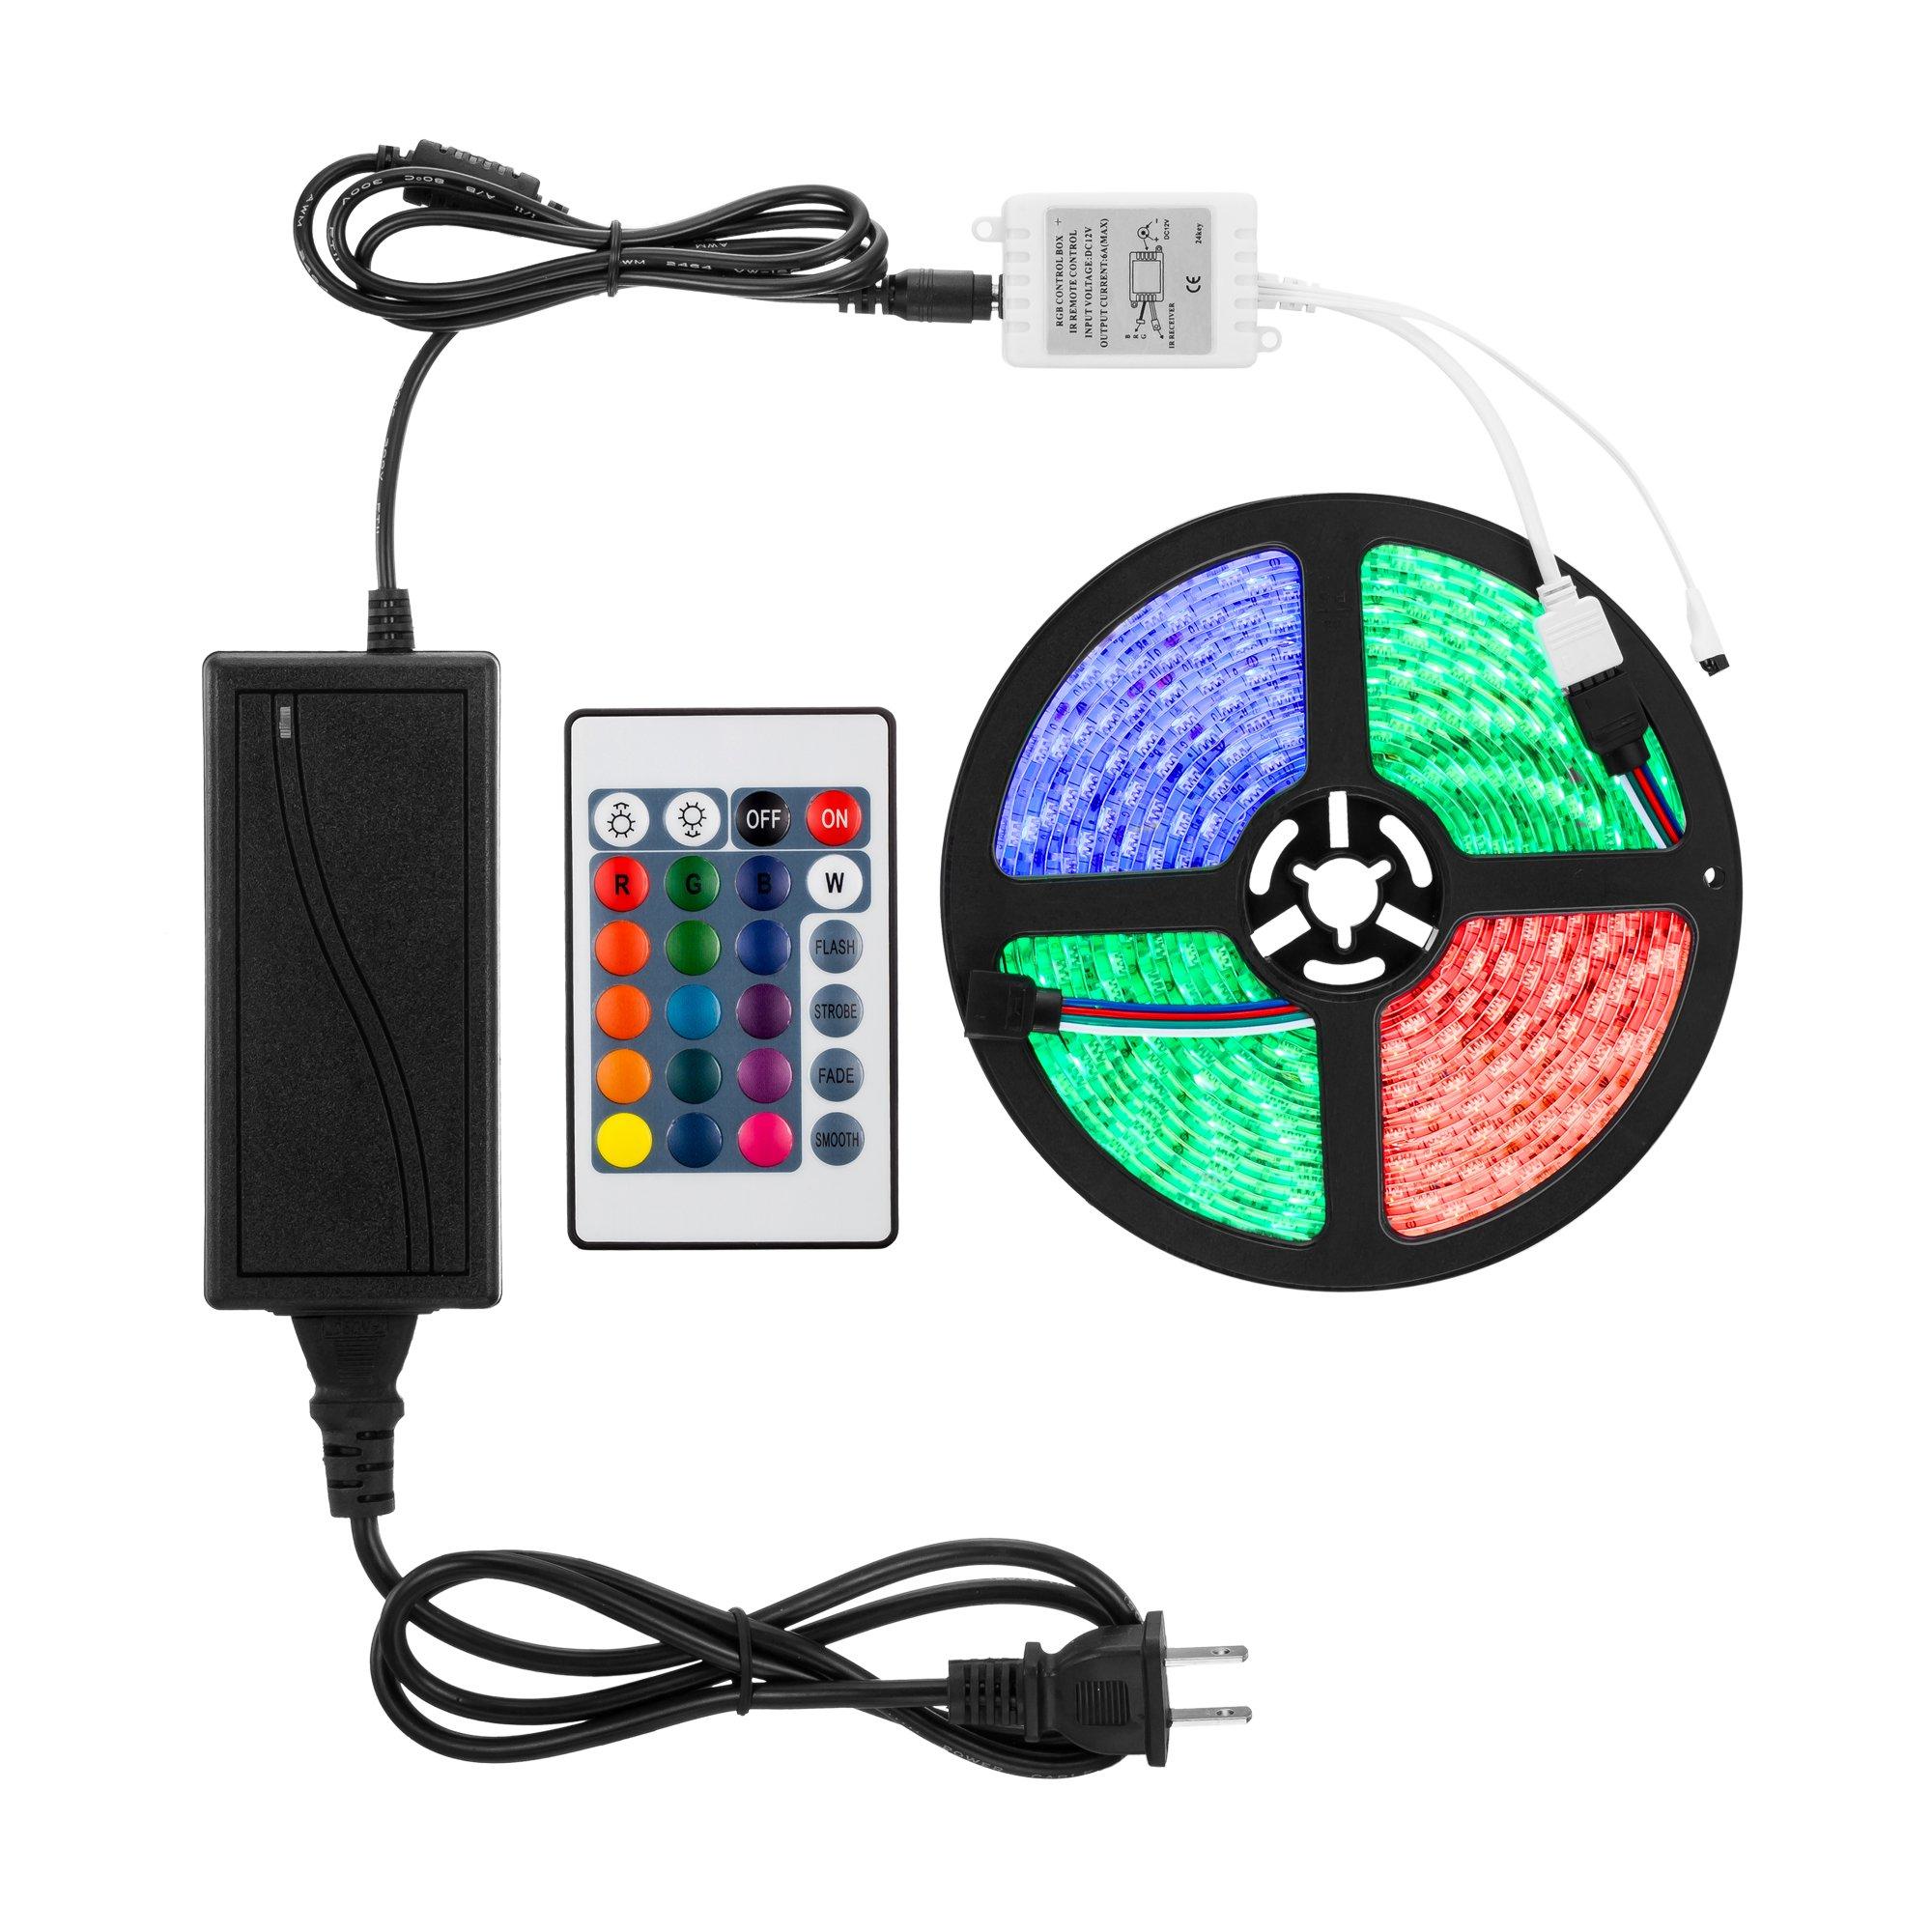 EMANER RGB Strip Lights,16.4 ft/5M, 5050SMD 300pcs LEDs, Waterproof Flexible Strip Light, IR Remote Controller, DC 12V Power Adapter Plug, Home Cabinet Garden Party Decor Strip Light, car Decor Light